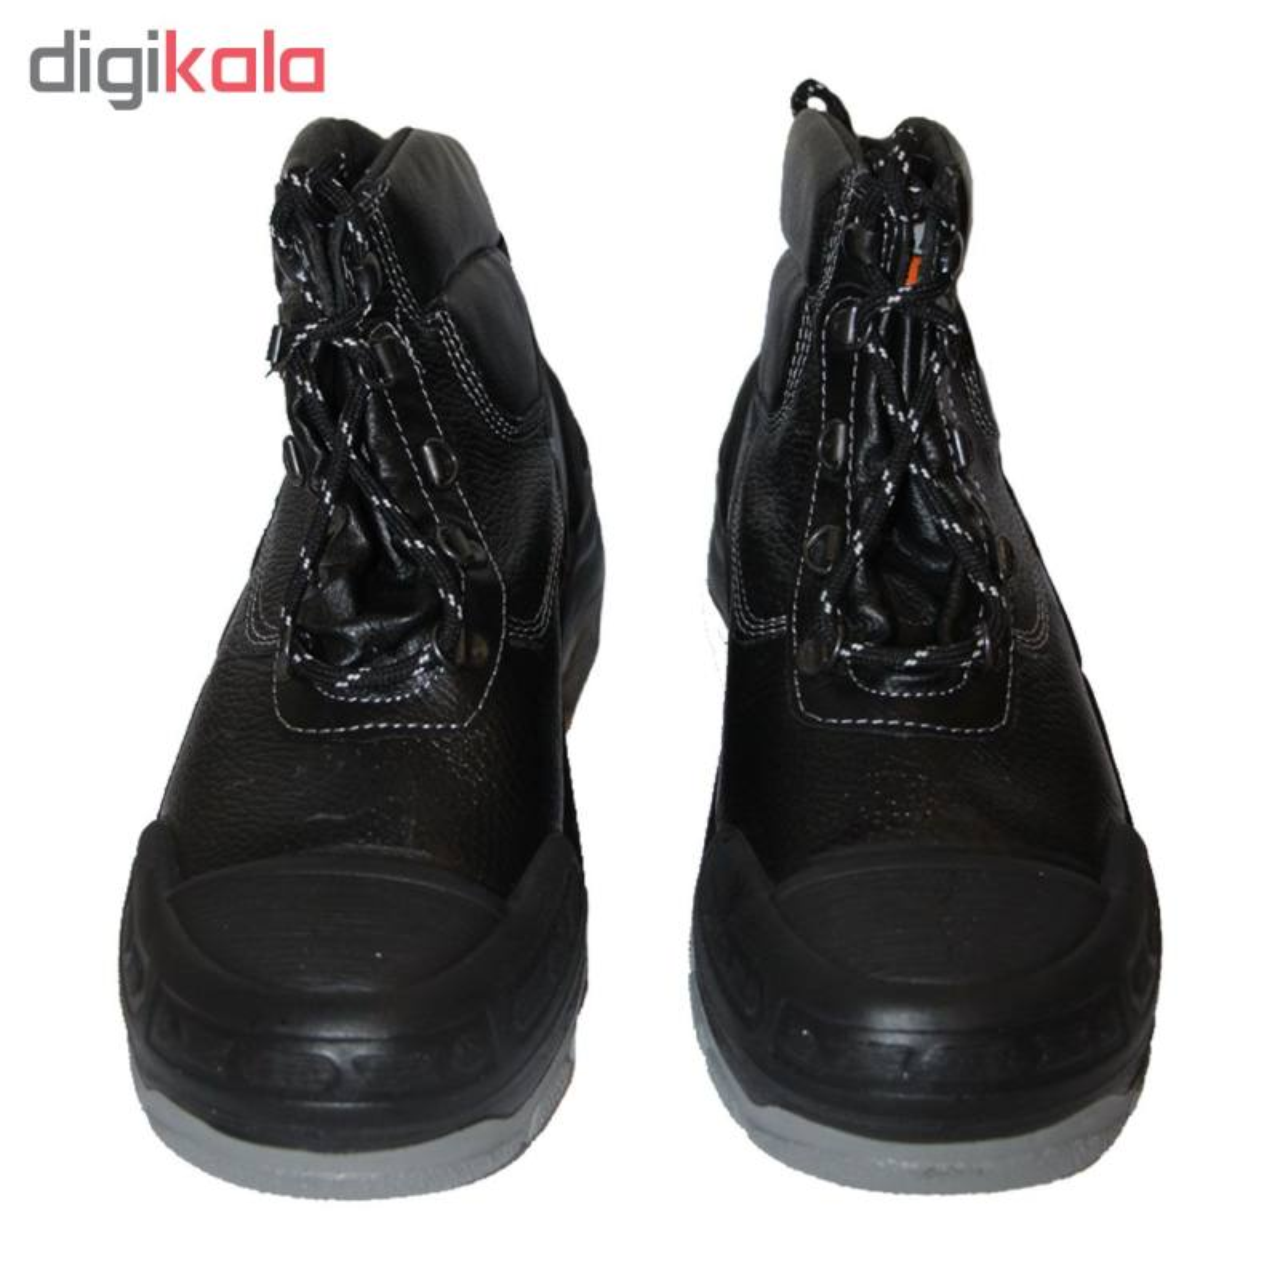 کفش ایمنی کلار مدل پوتین کواترو 7220